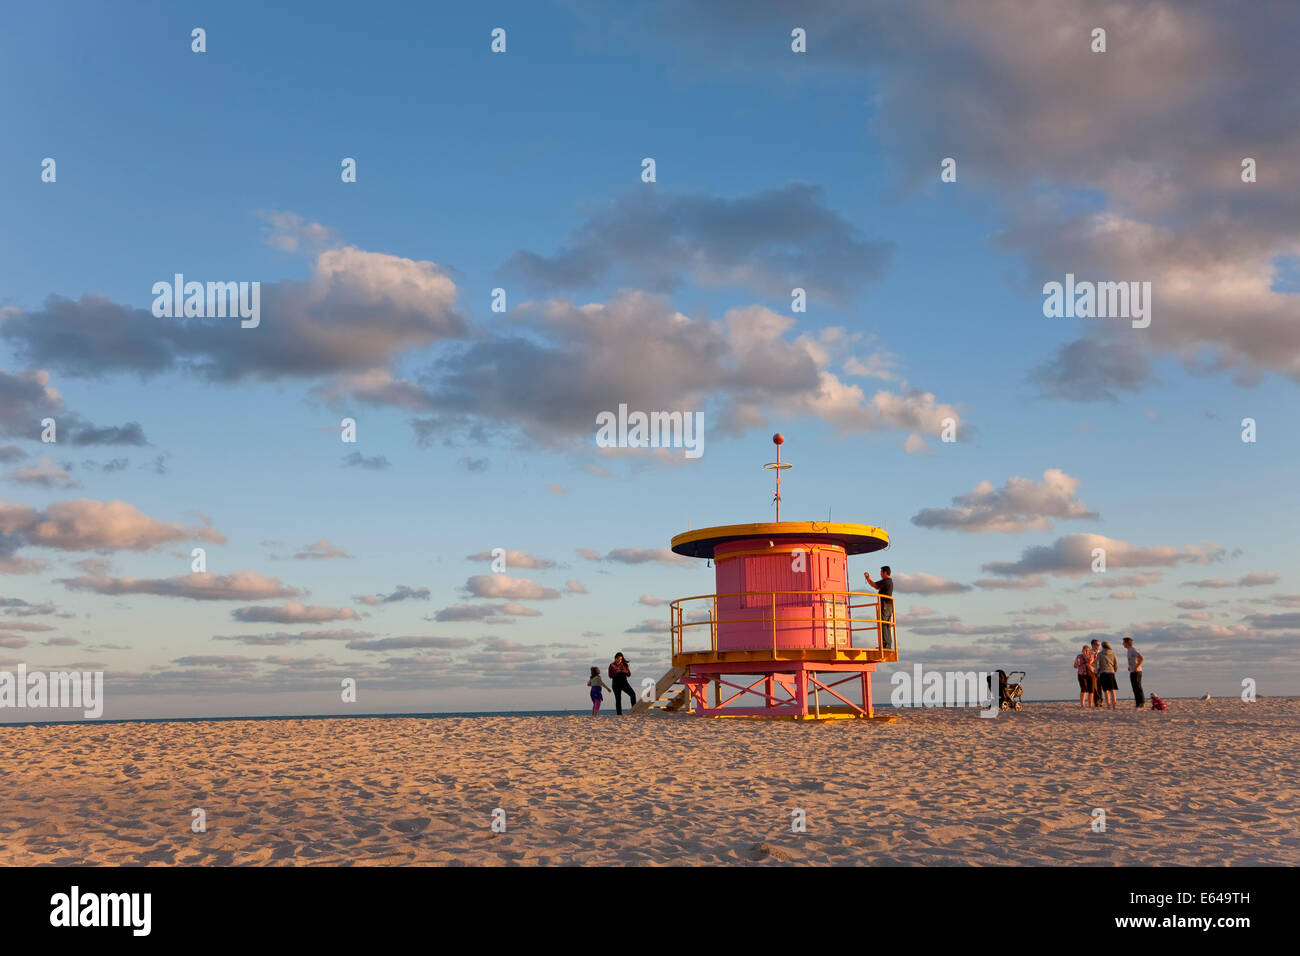 Lifeguard hut, South Beach, Miami, Florida, Stati Uniti d'America Immagini Stock